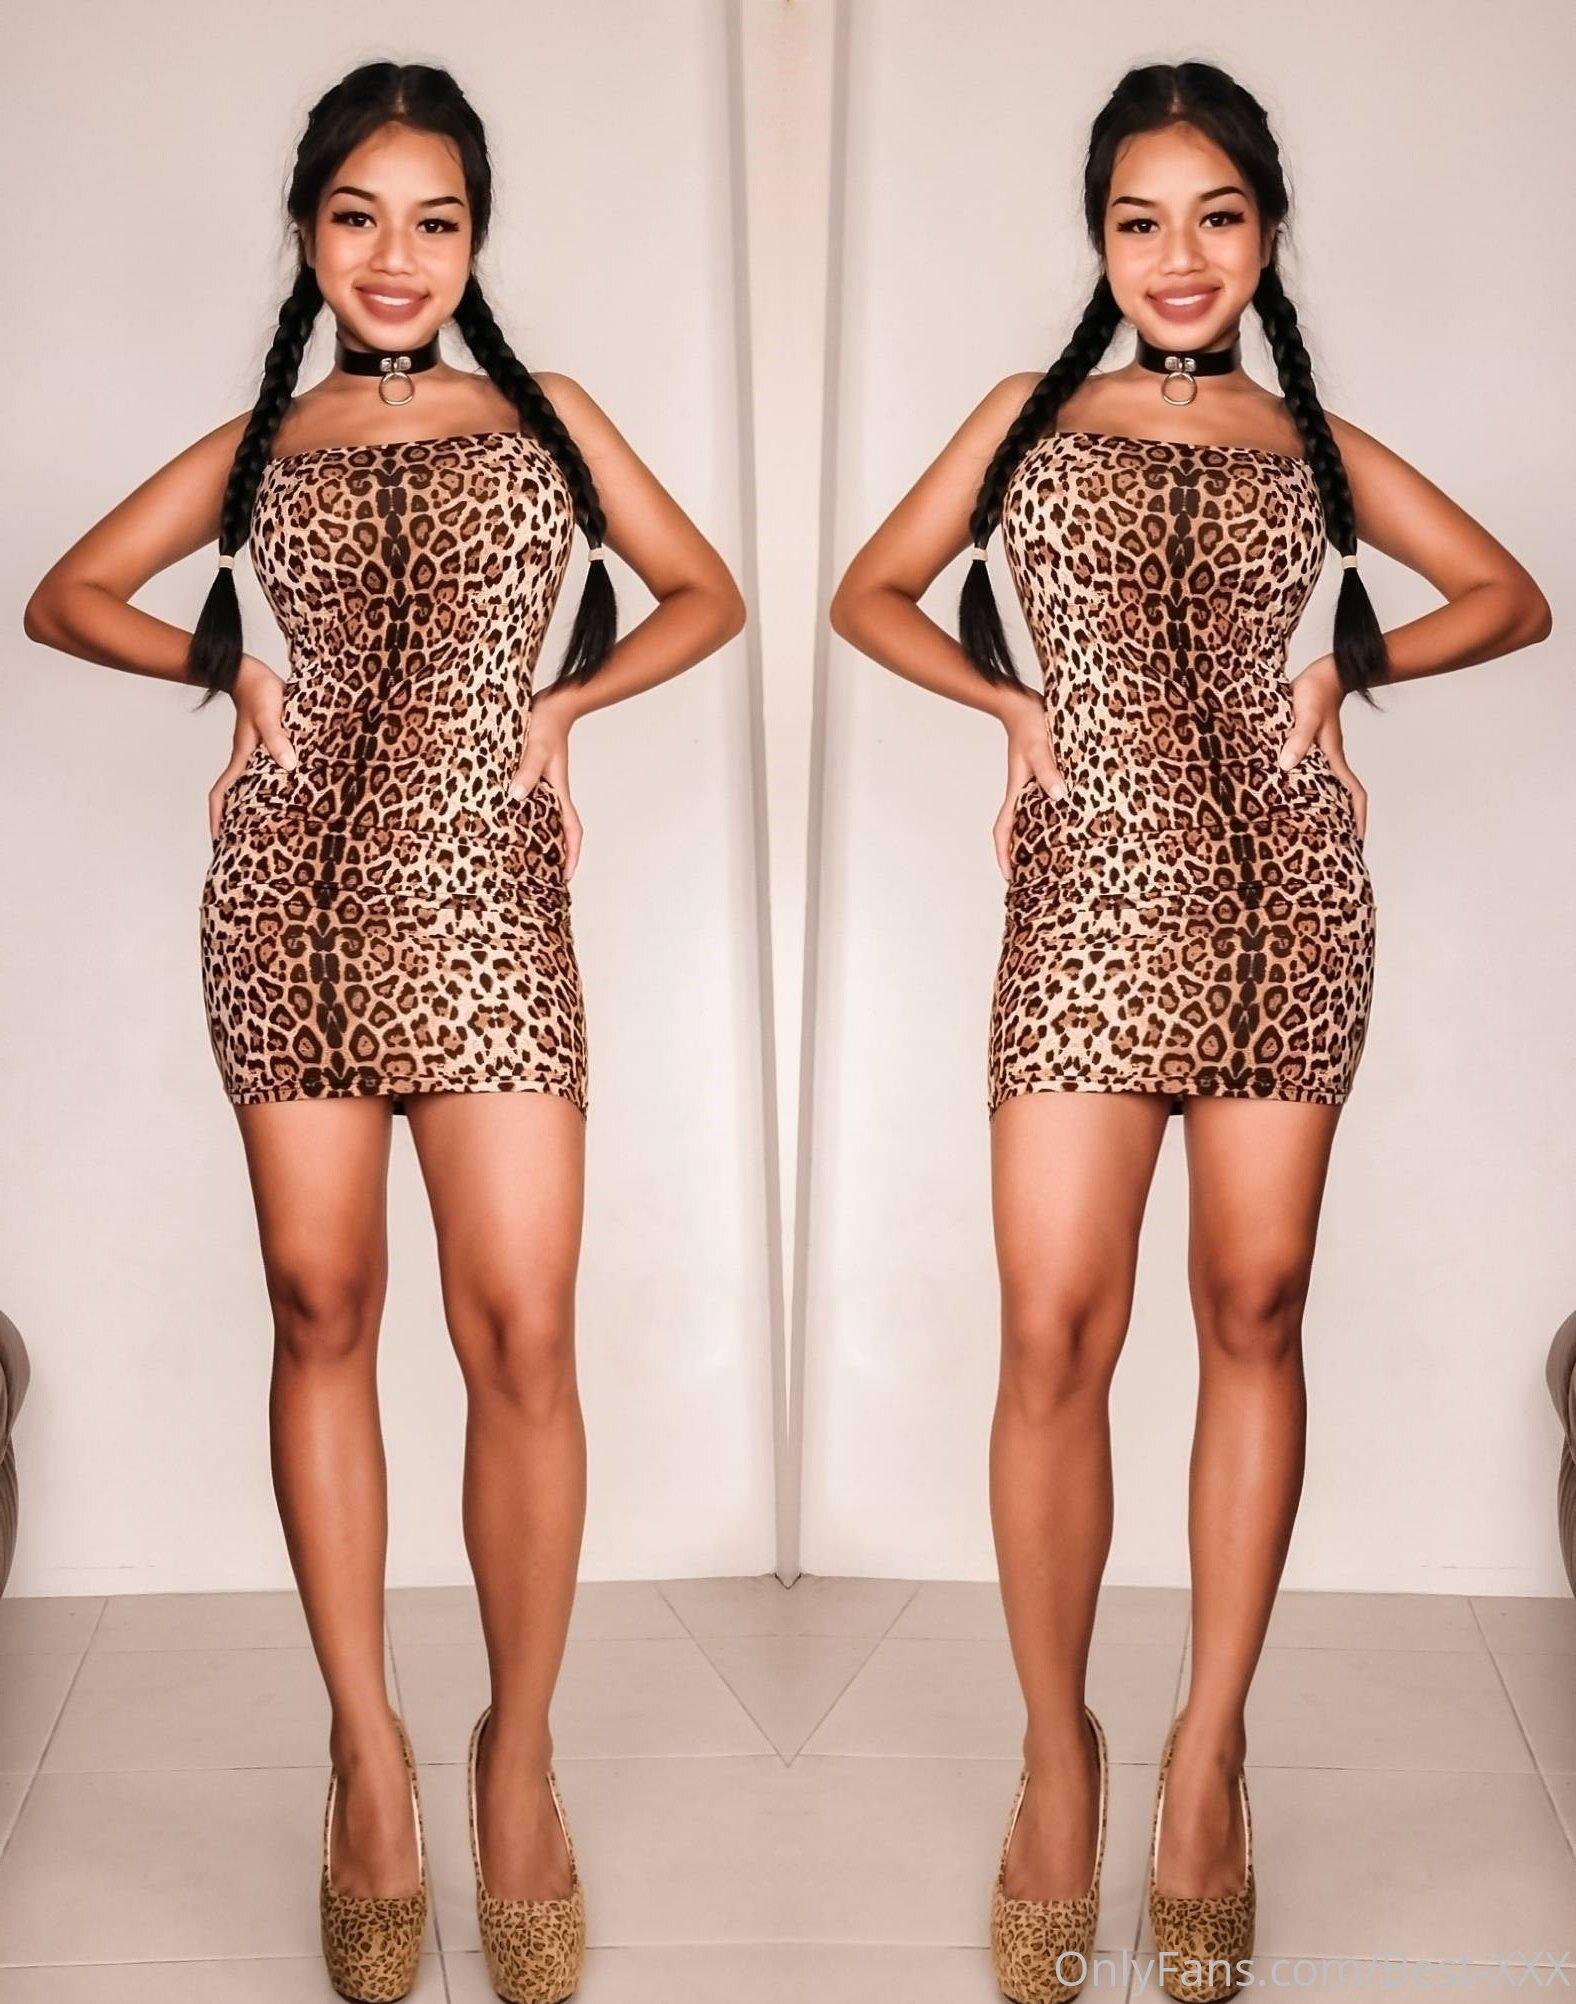 Mo Thai Pattaya Girl Leaked Onlyfans Best Xxx 0149